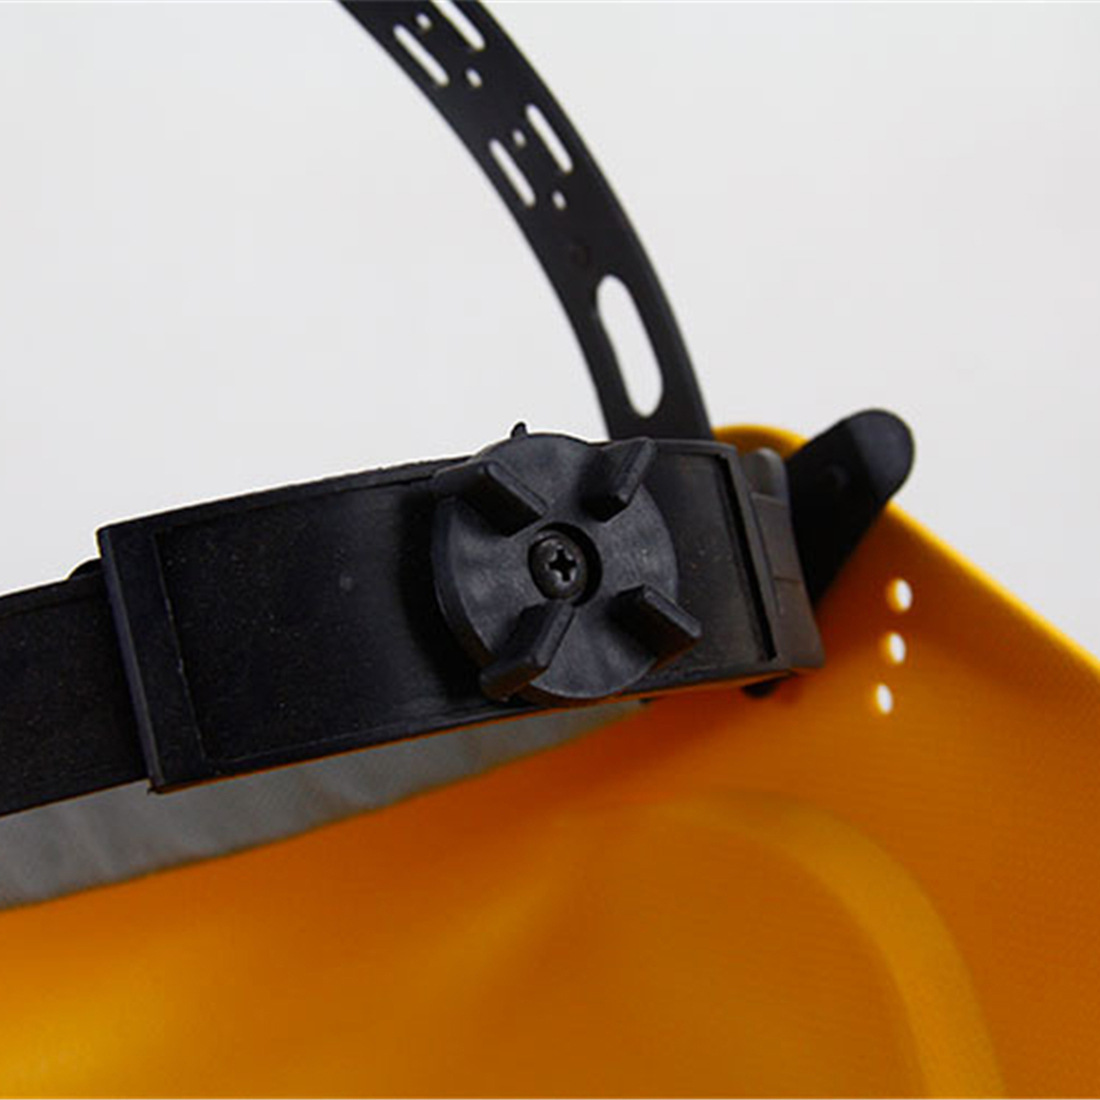 Solar Auto Changing Light Welding Mask/Helmet/Welder Cap/Welding Lens/Eyes Mask for Welding Machine and Plasma Cutting Tool